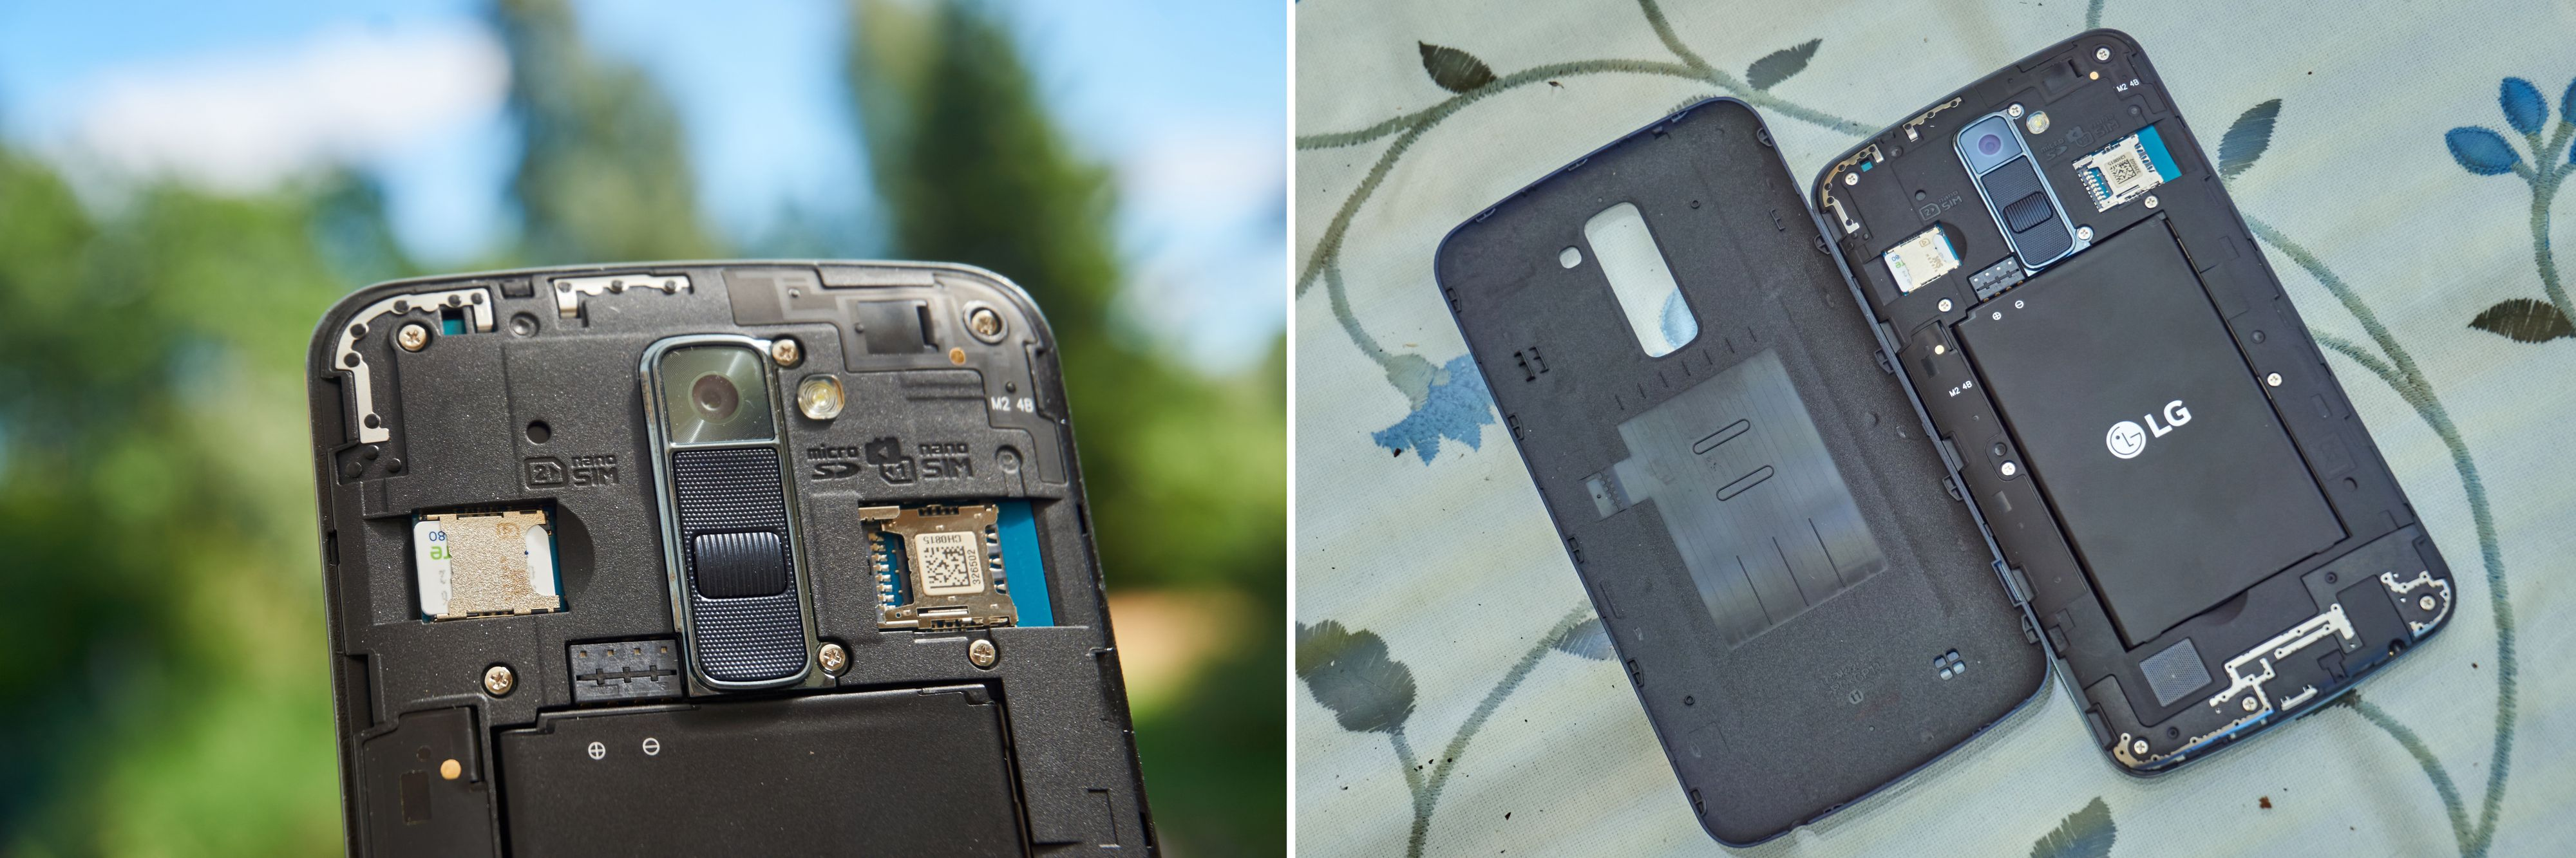 De to dedikerte SIM-kort-inngangene er et solid pluss. At du kan bytte batteri det samme. Bilde: Torstein Norum Bugge, Tek.no/montasje